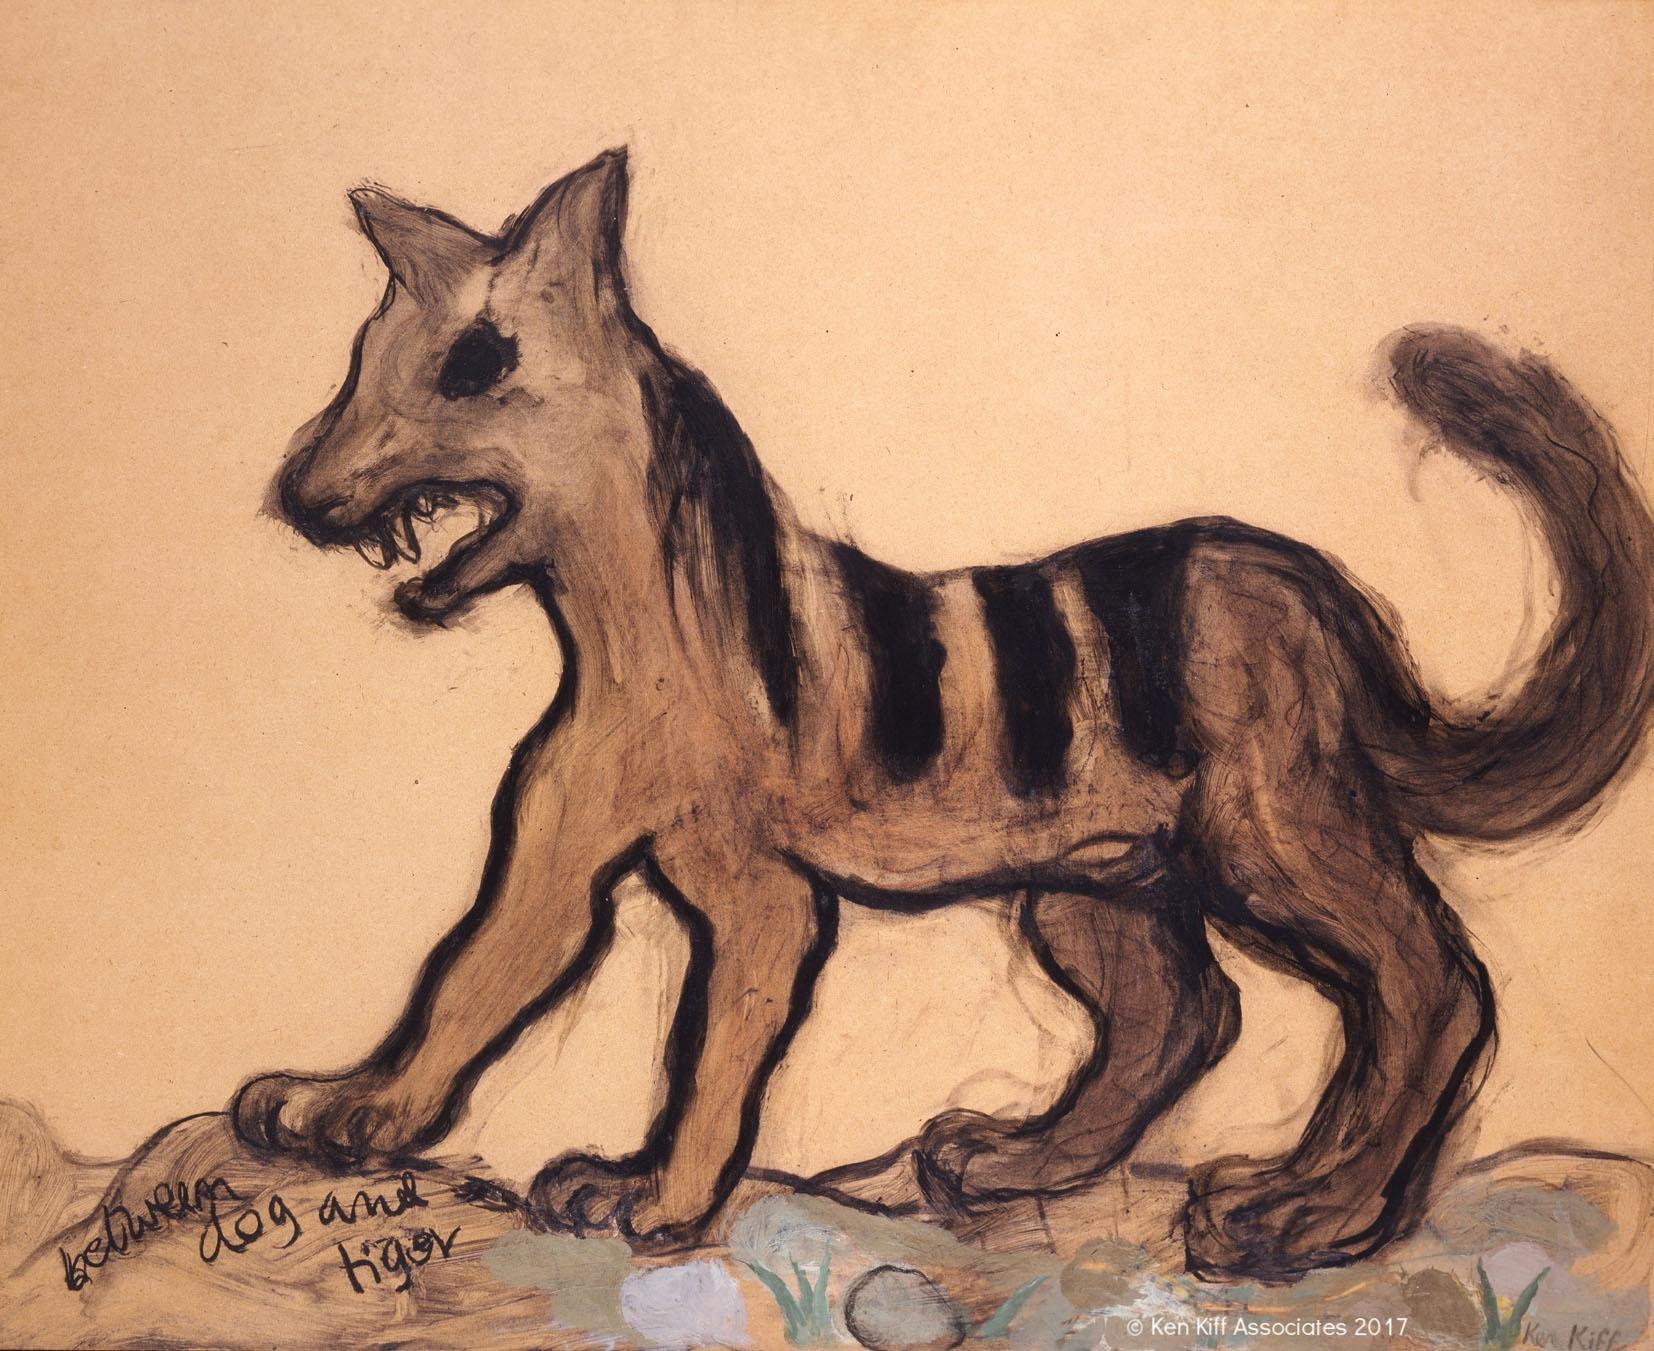 Ken Kiff - Between Dog and Tiger